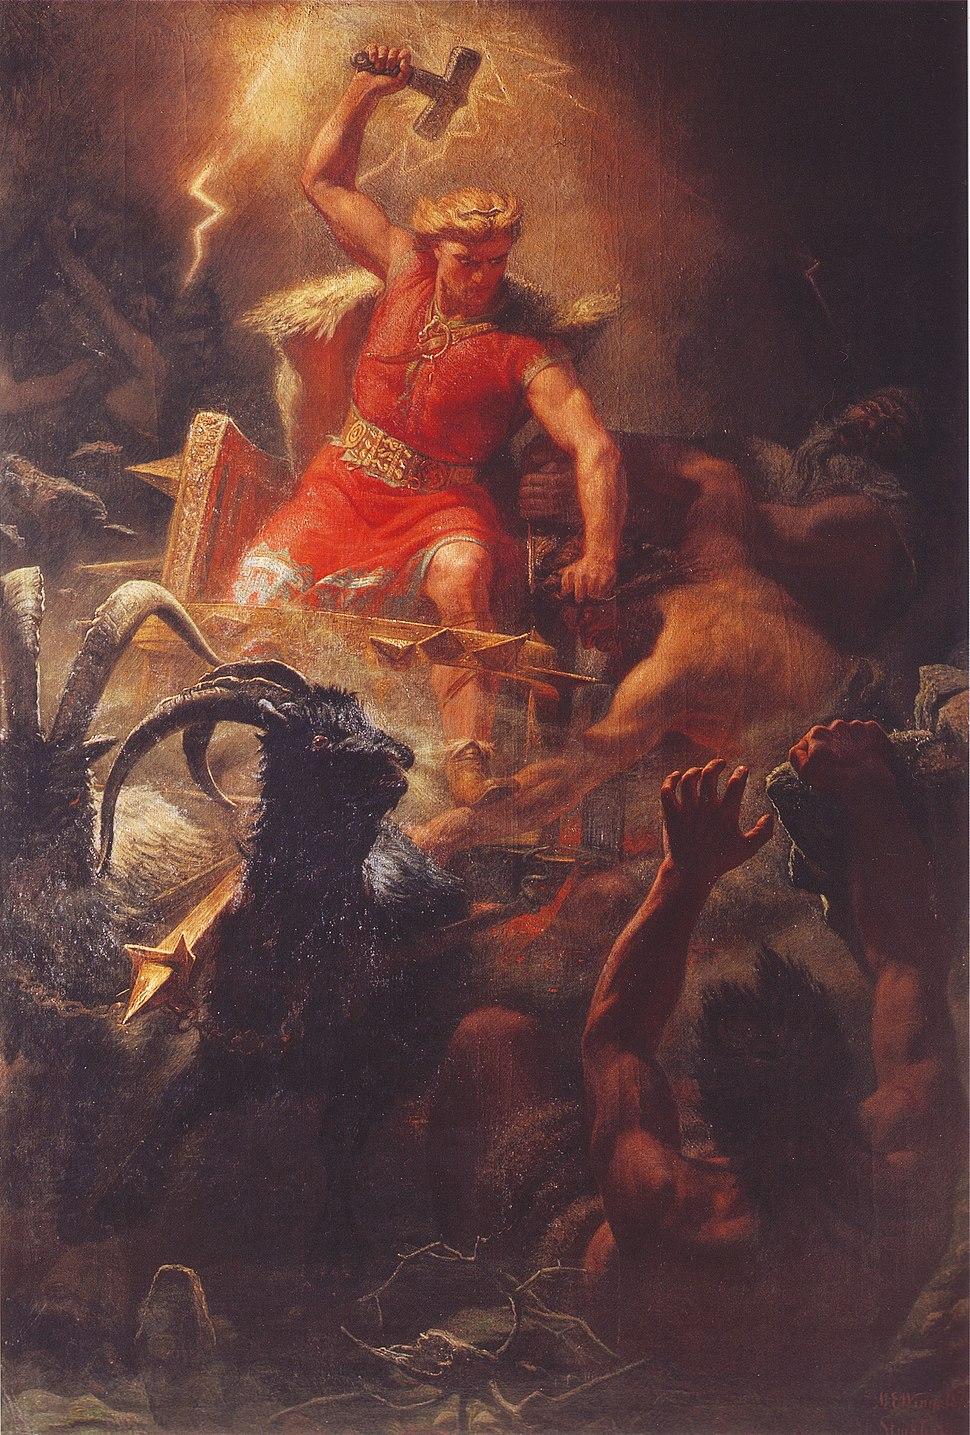 Thor's Battle Against the Jötnar (1872) by Mårten Eskil Winge